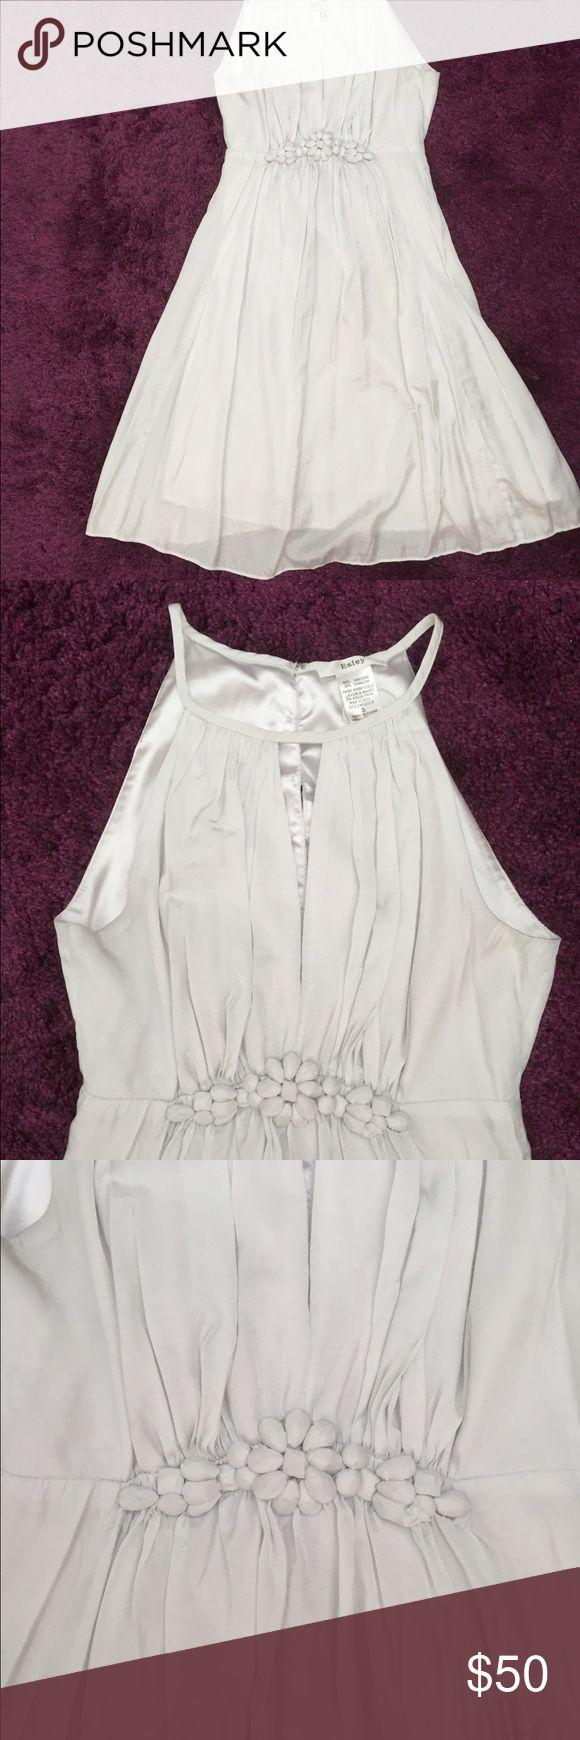 Crib thanksgiving sale - Thanksgiving Sale White Mid Length Dress